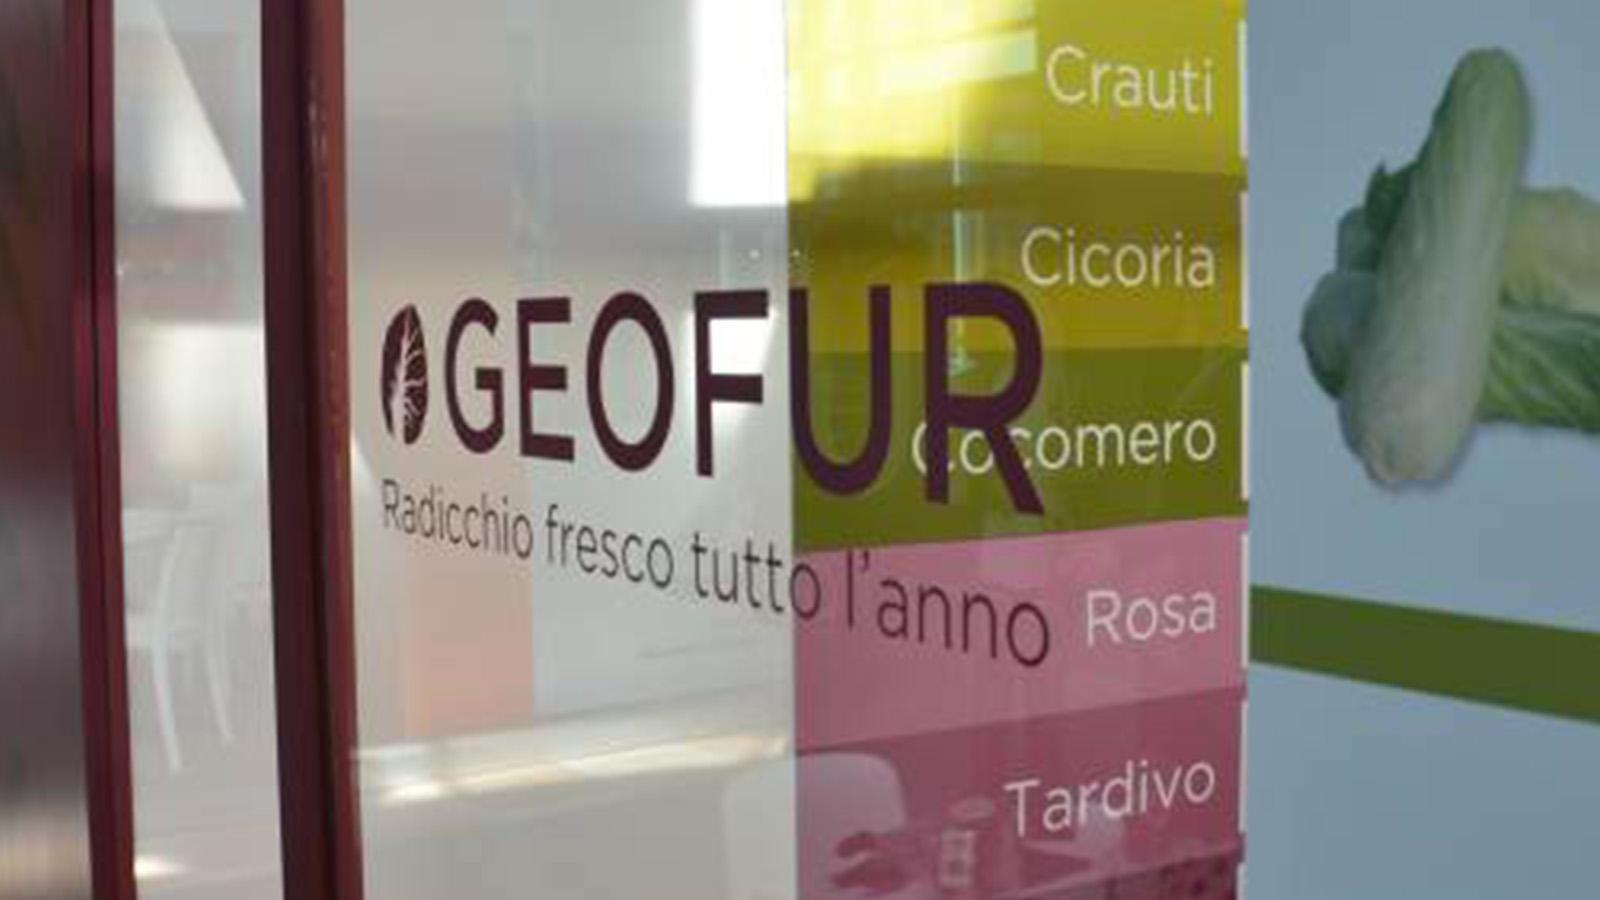 geofur-macfrut-2019-ufficio